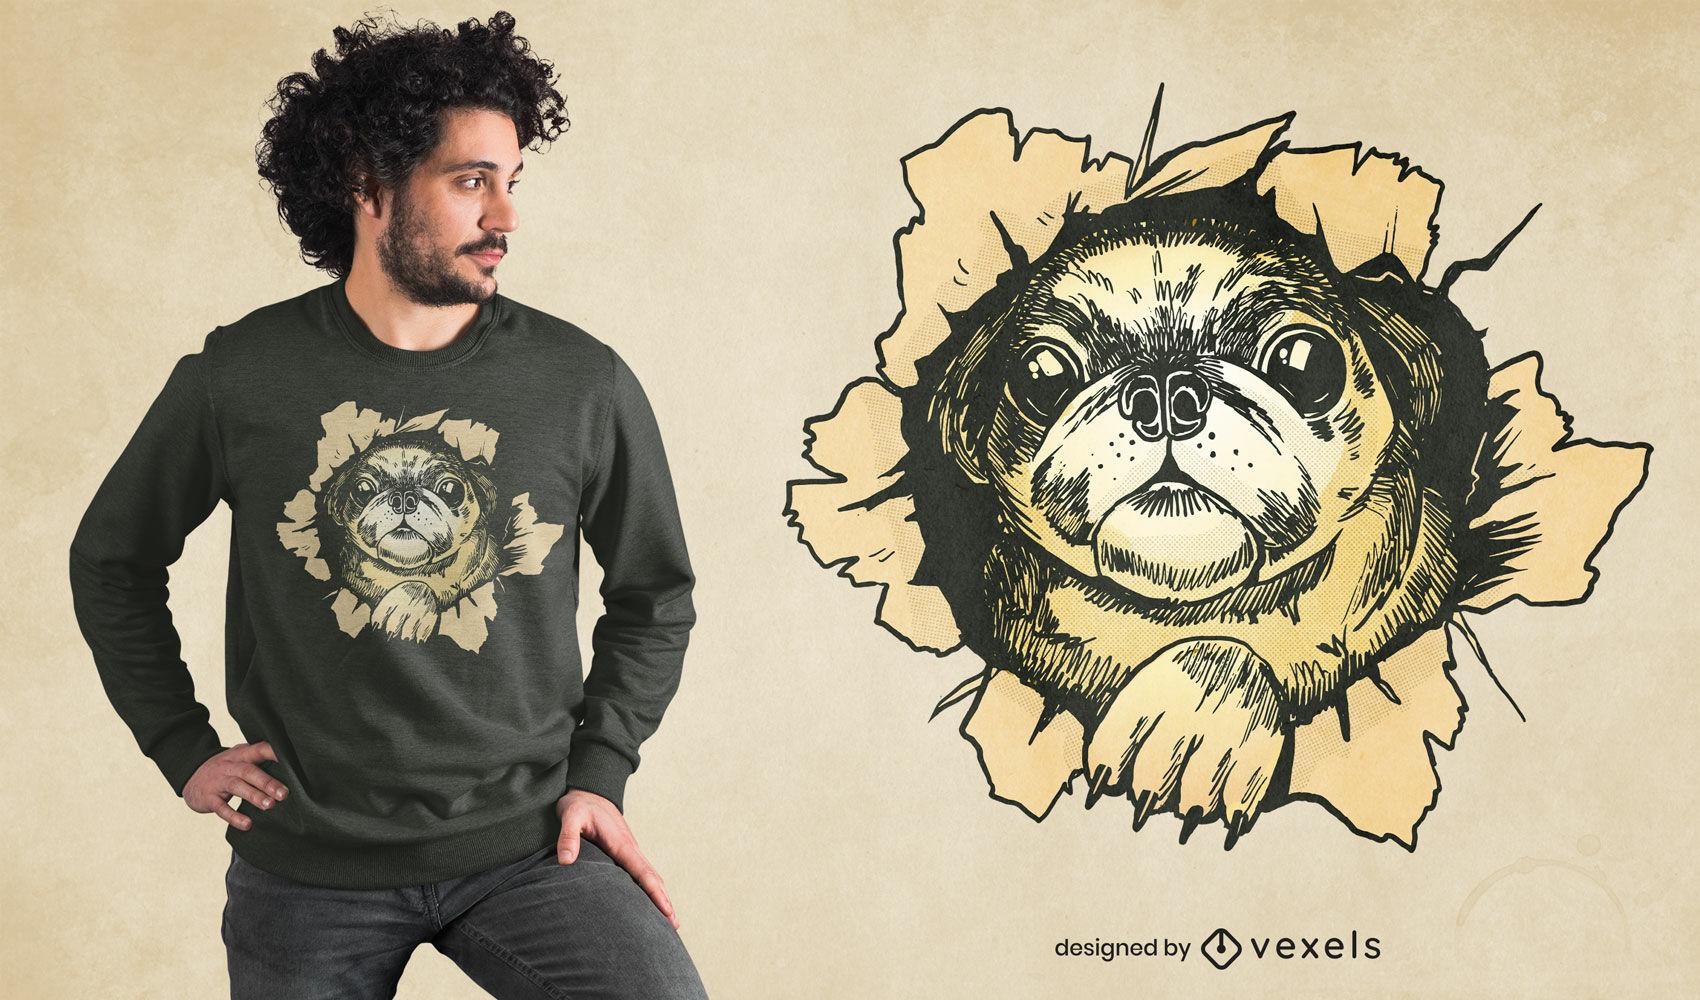 Mops Hund zerrissene Wand T-Shirt Design